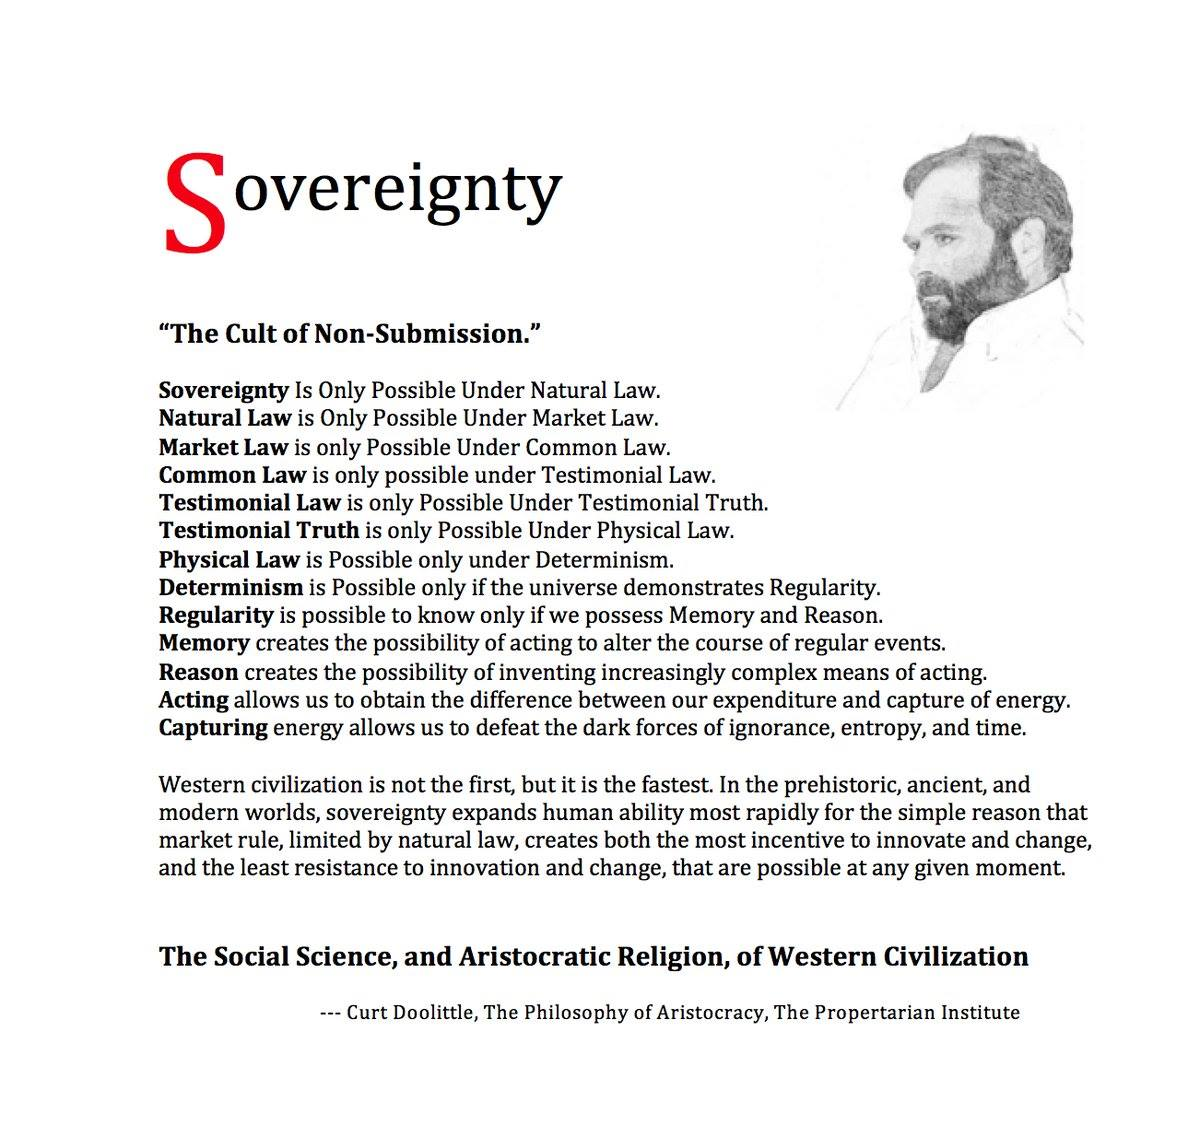 Sovereignty: The Distillation of Western Civilization